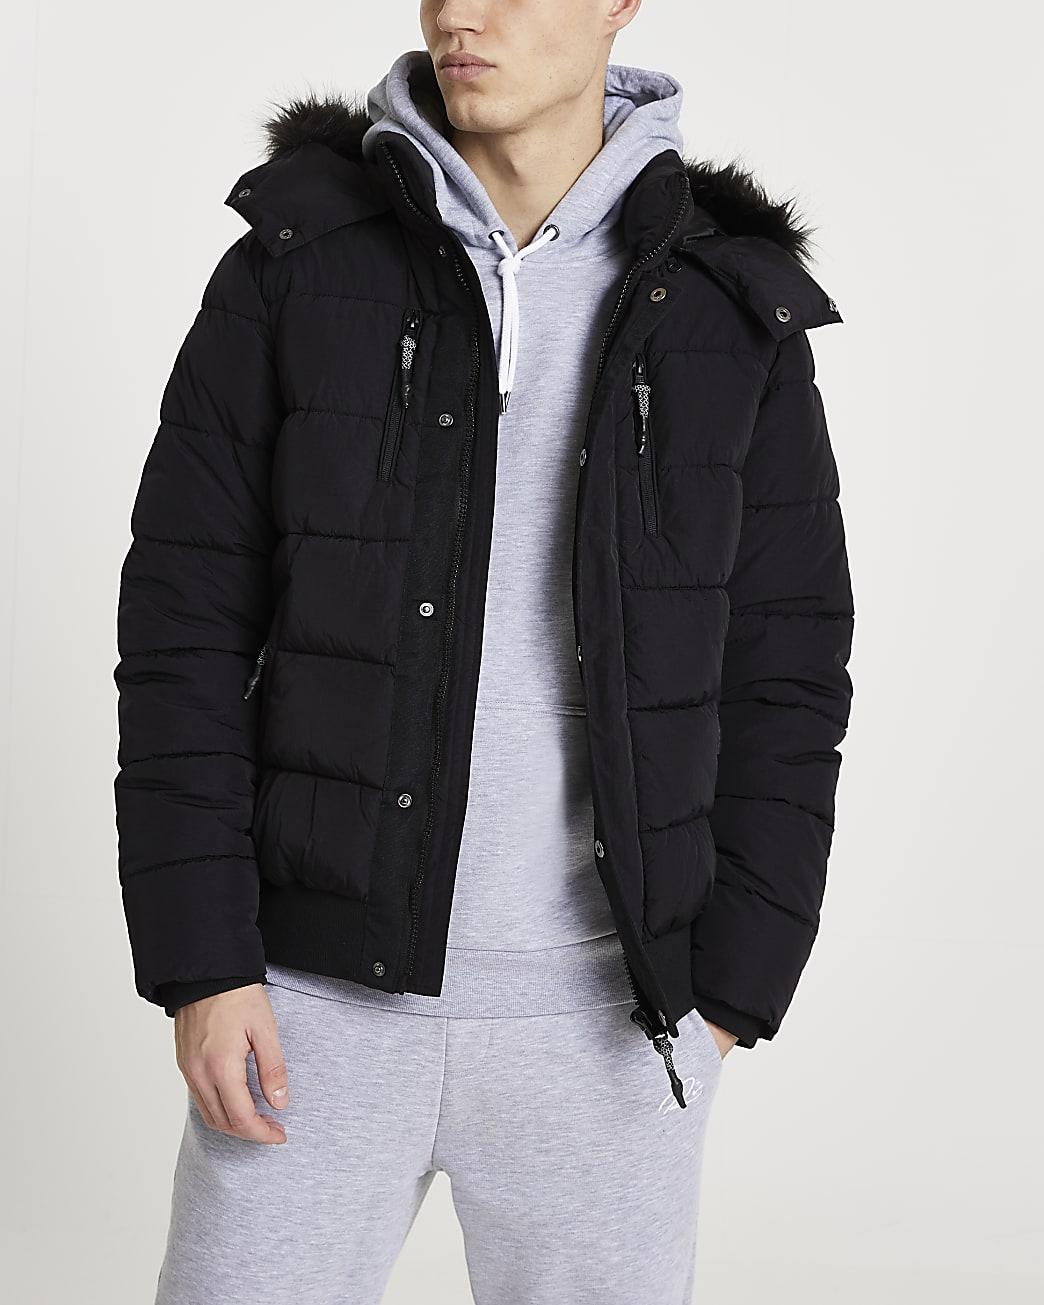 Black faux fur hooded puffer